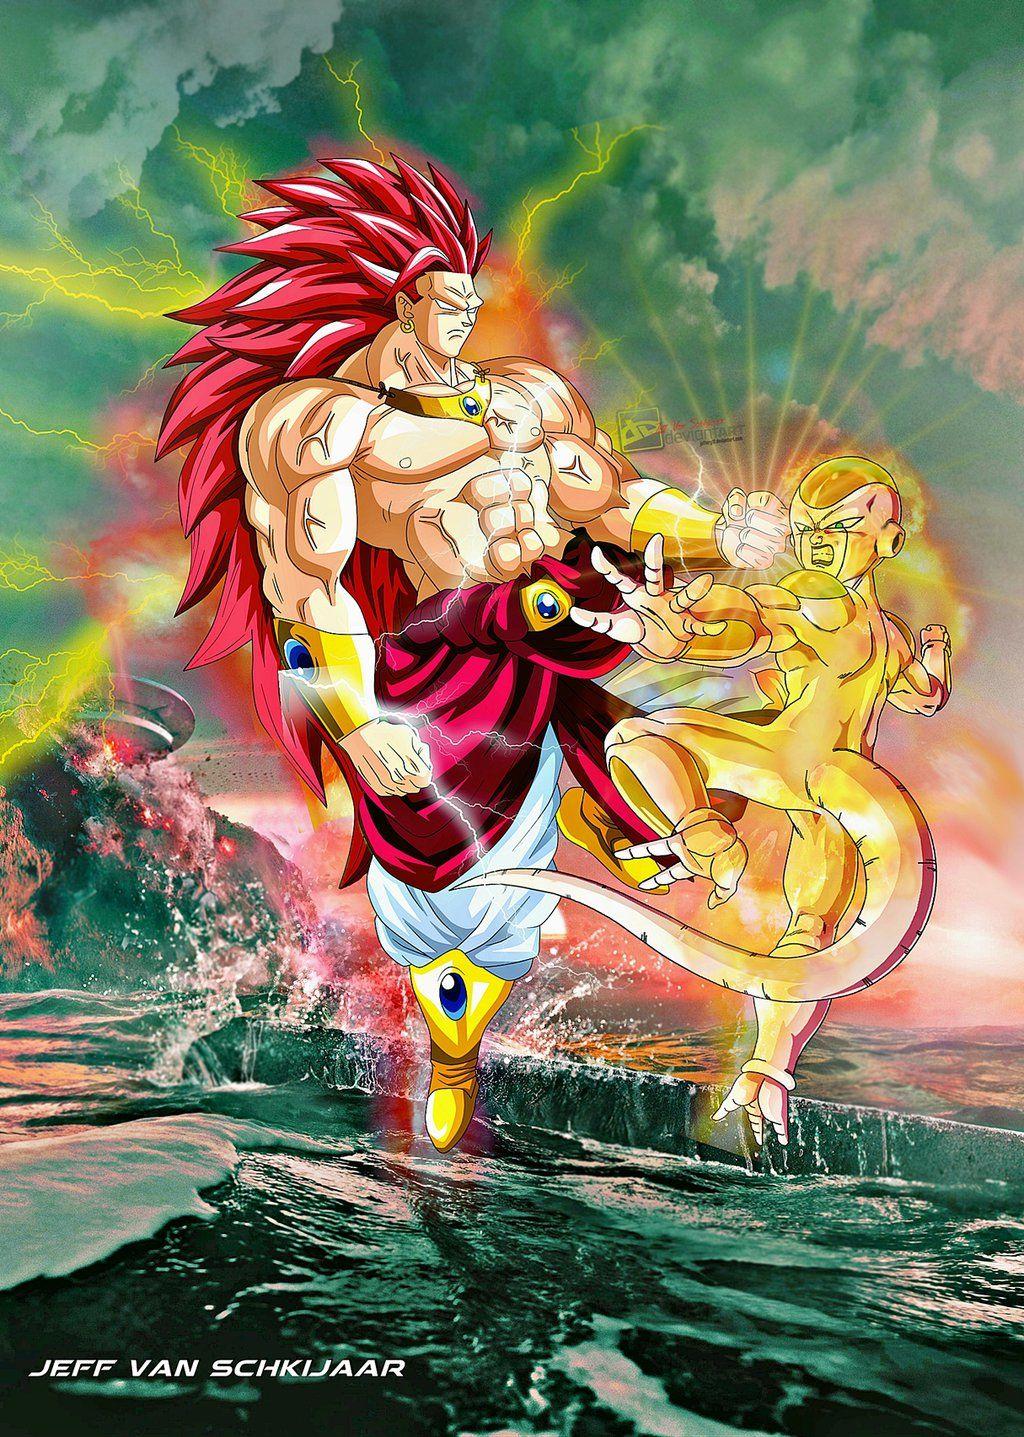 Broly super saiyan god 2 vs new revived frieza by - Foto goku super saiyan god ...